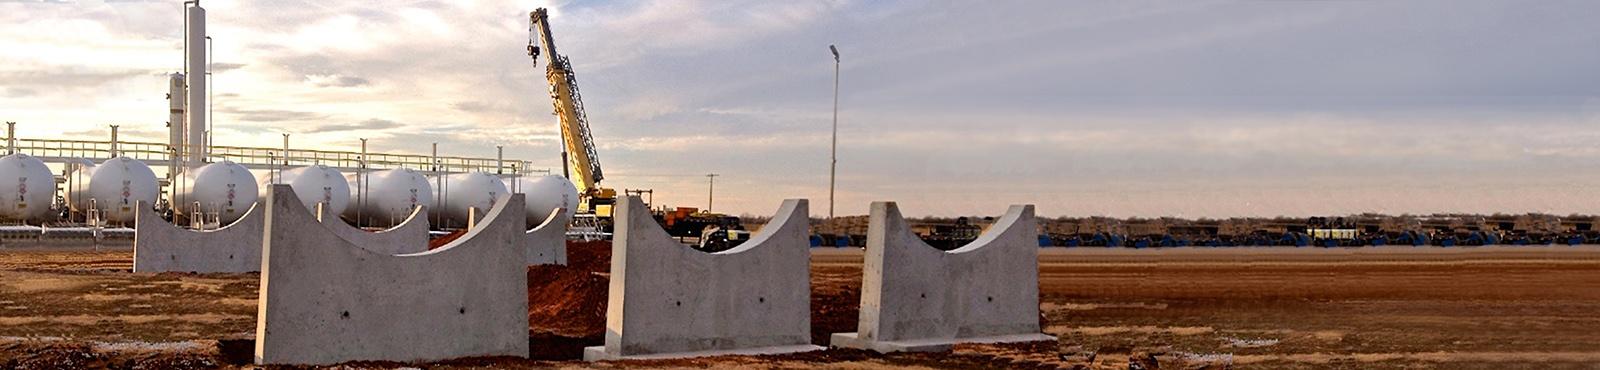 NGL LPG Propane Butane Pre-Cast Concrete Tank Piers and Saddles__.jpg